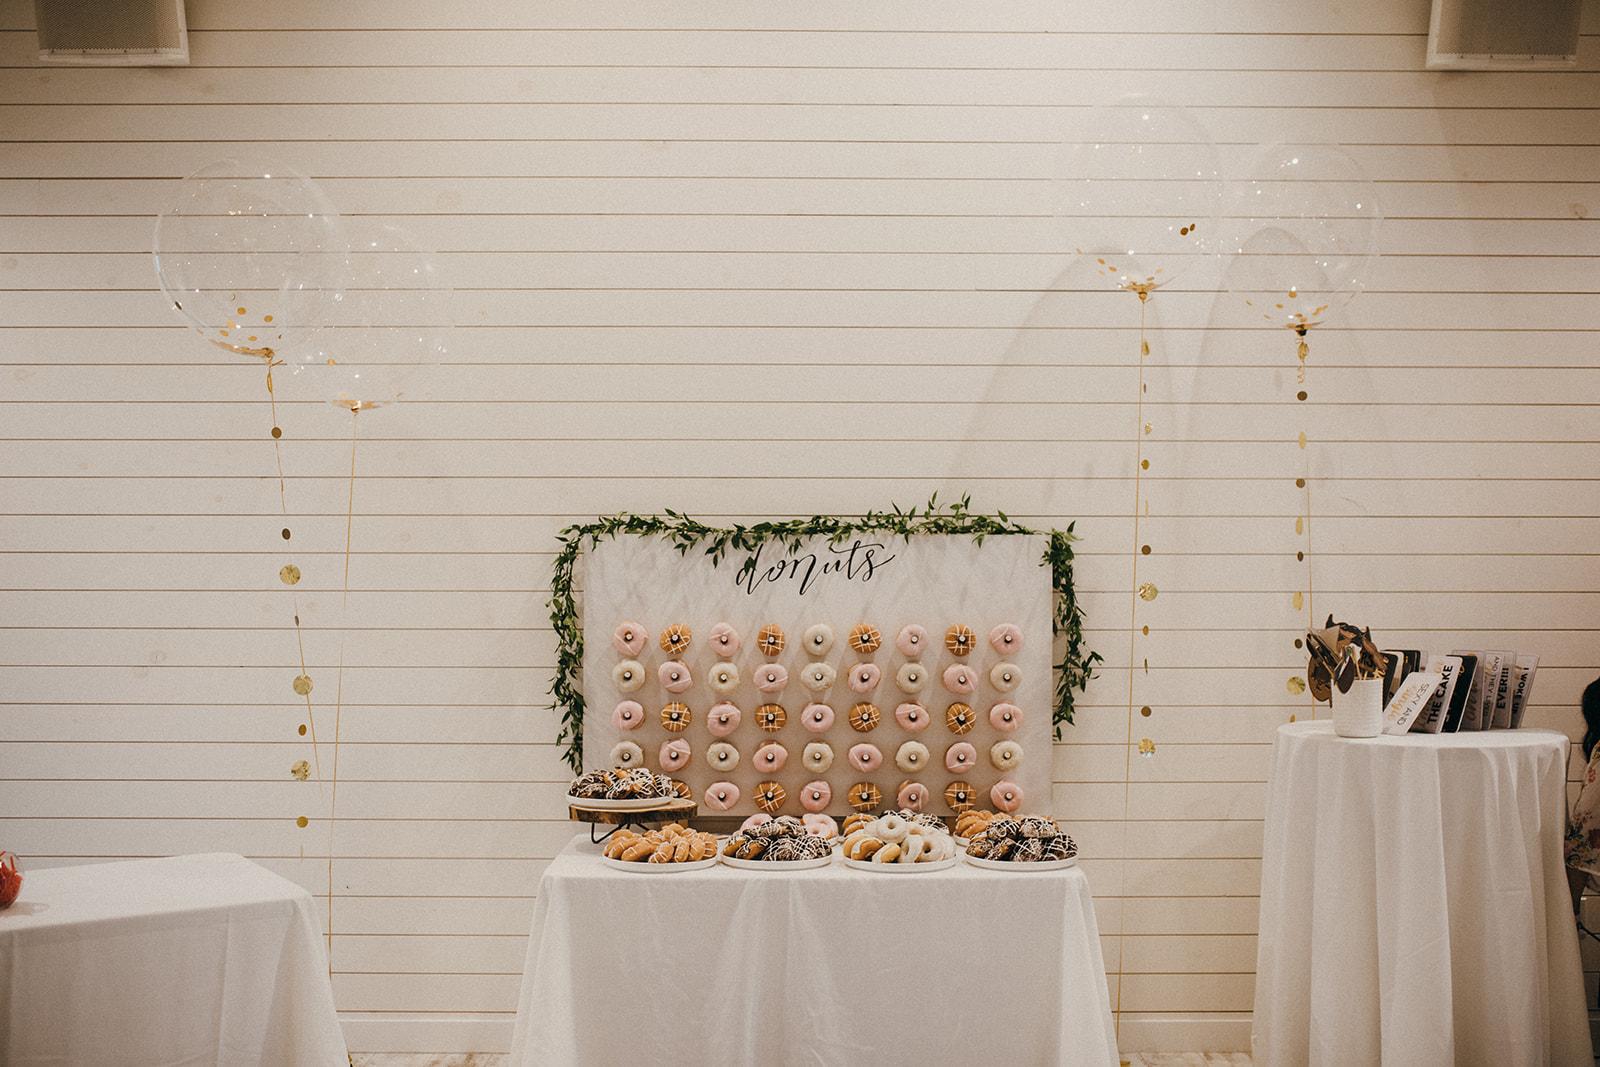 kaden_justine_wedding_4616.jpg